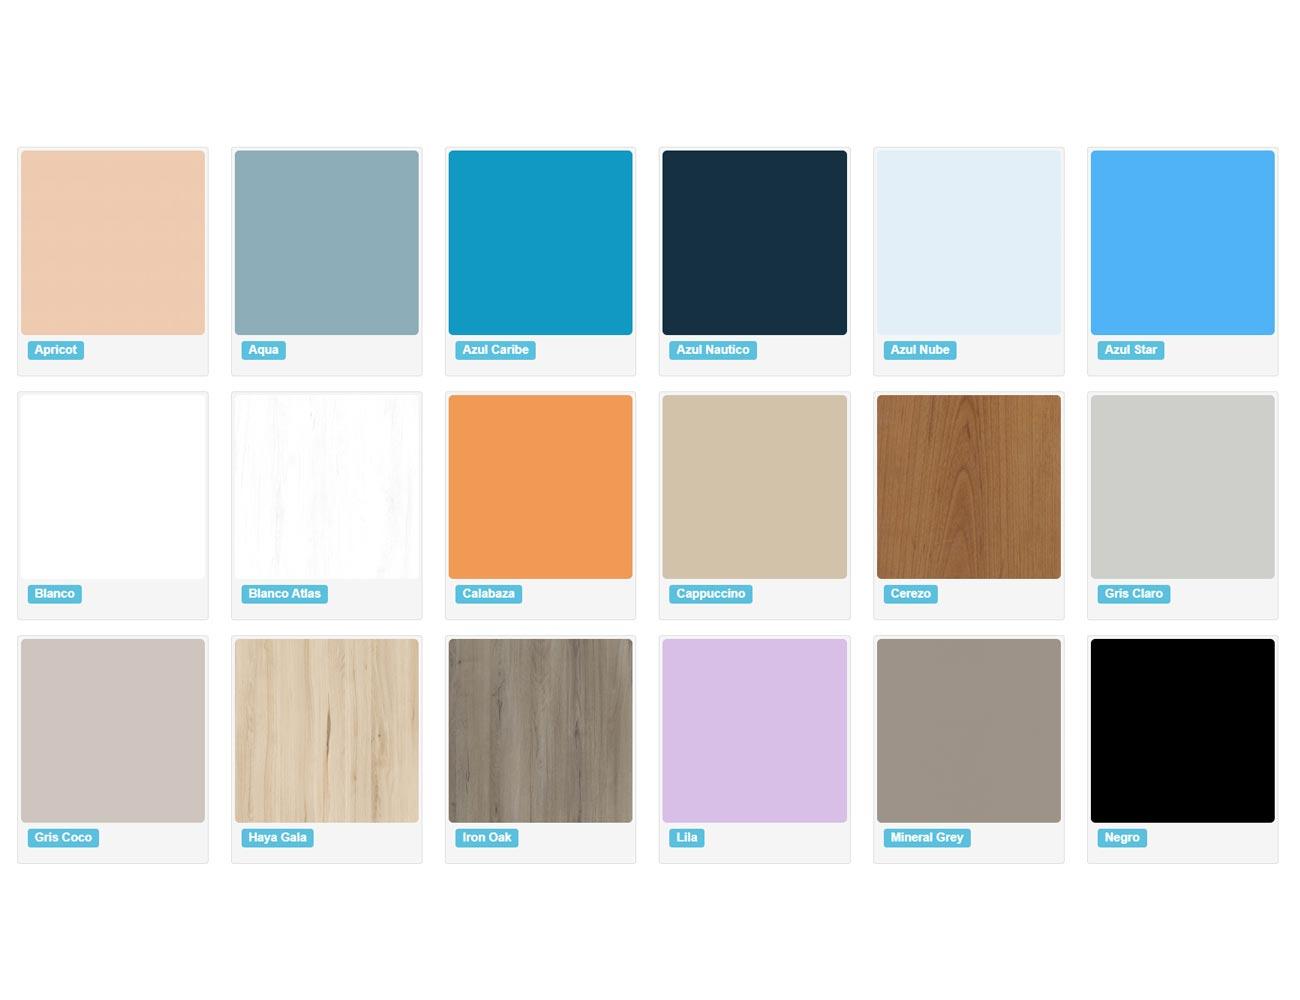 Colores218